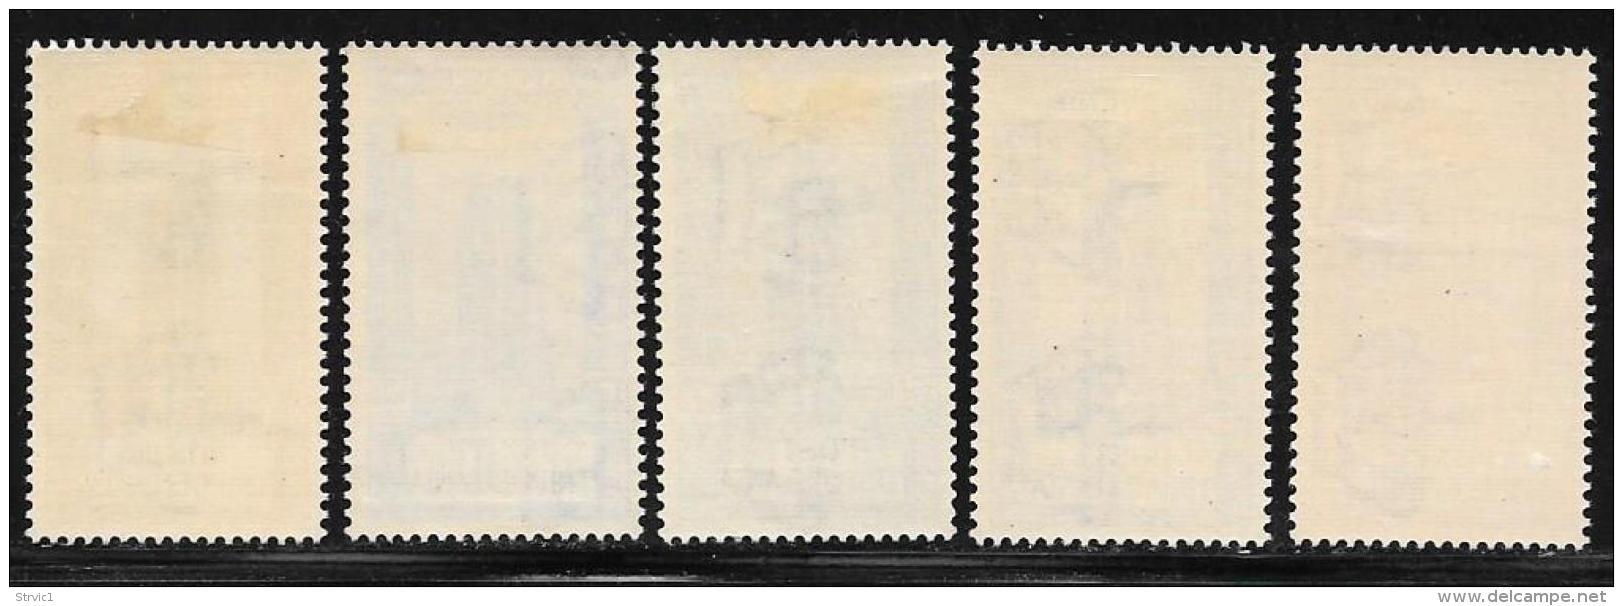 Tripolitania, Scott # B54-8 Mint Hinged Italy Semi-Postal Stamps Ancient Arch, Overprinted, 1930 - Tripolitania